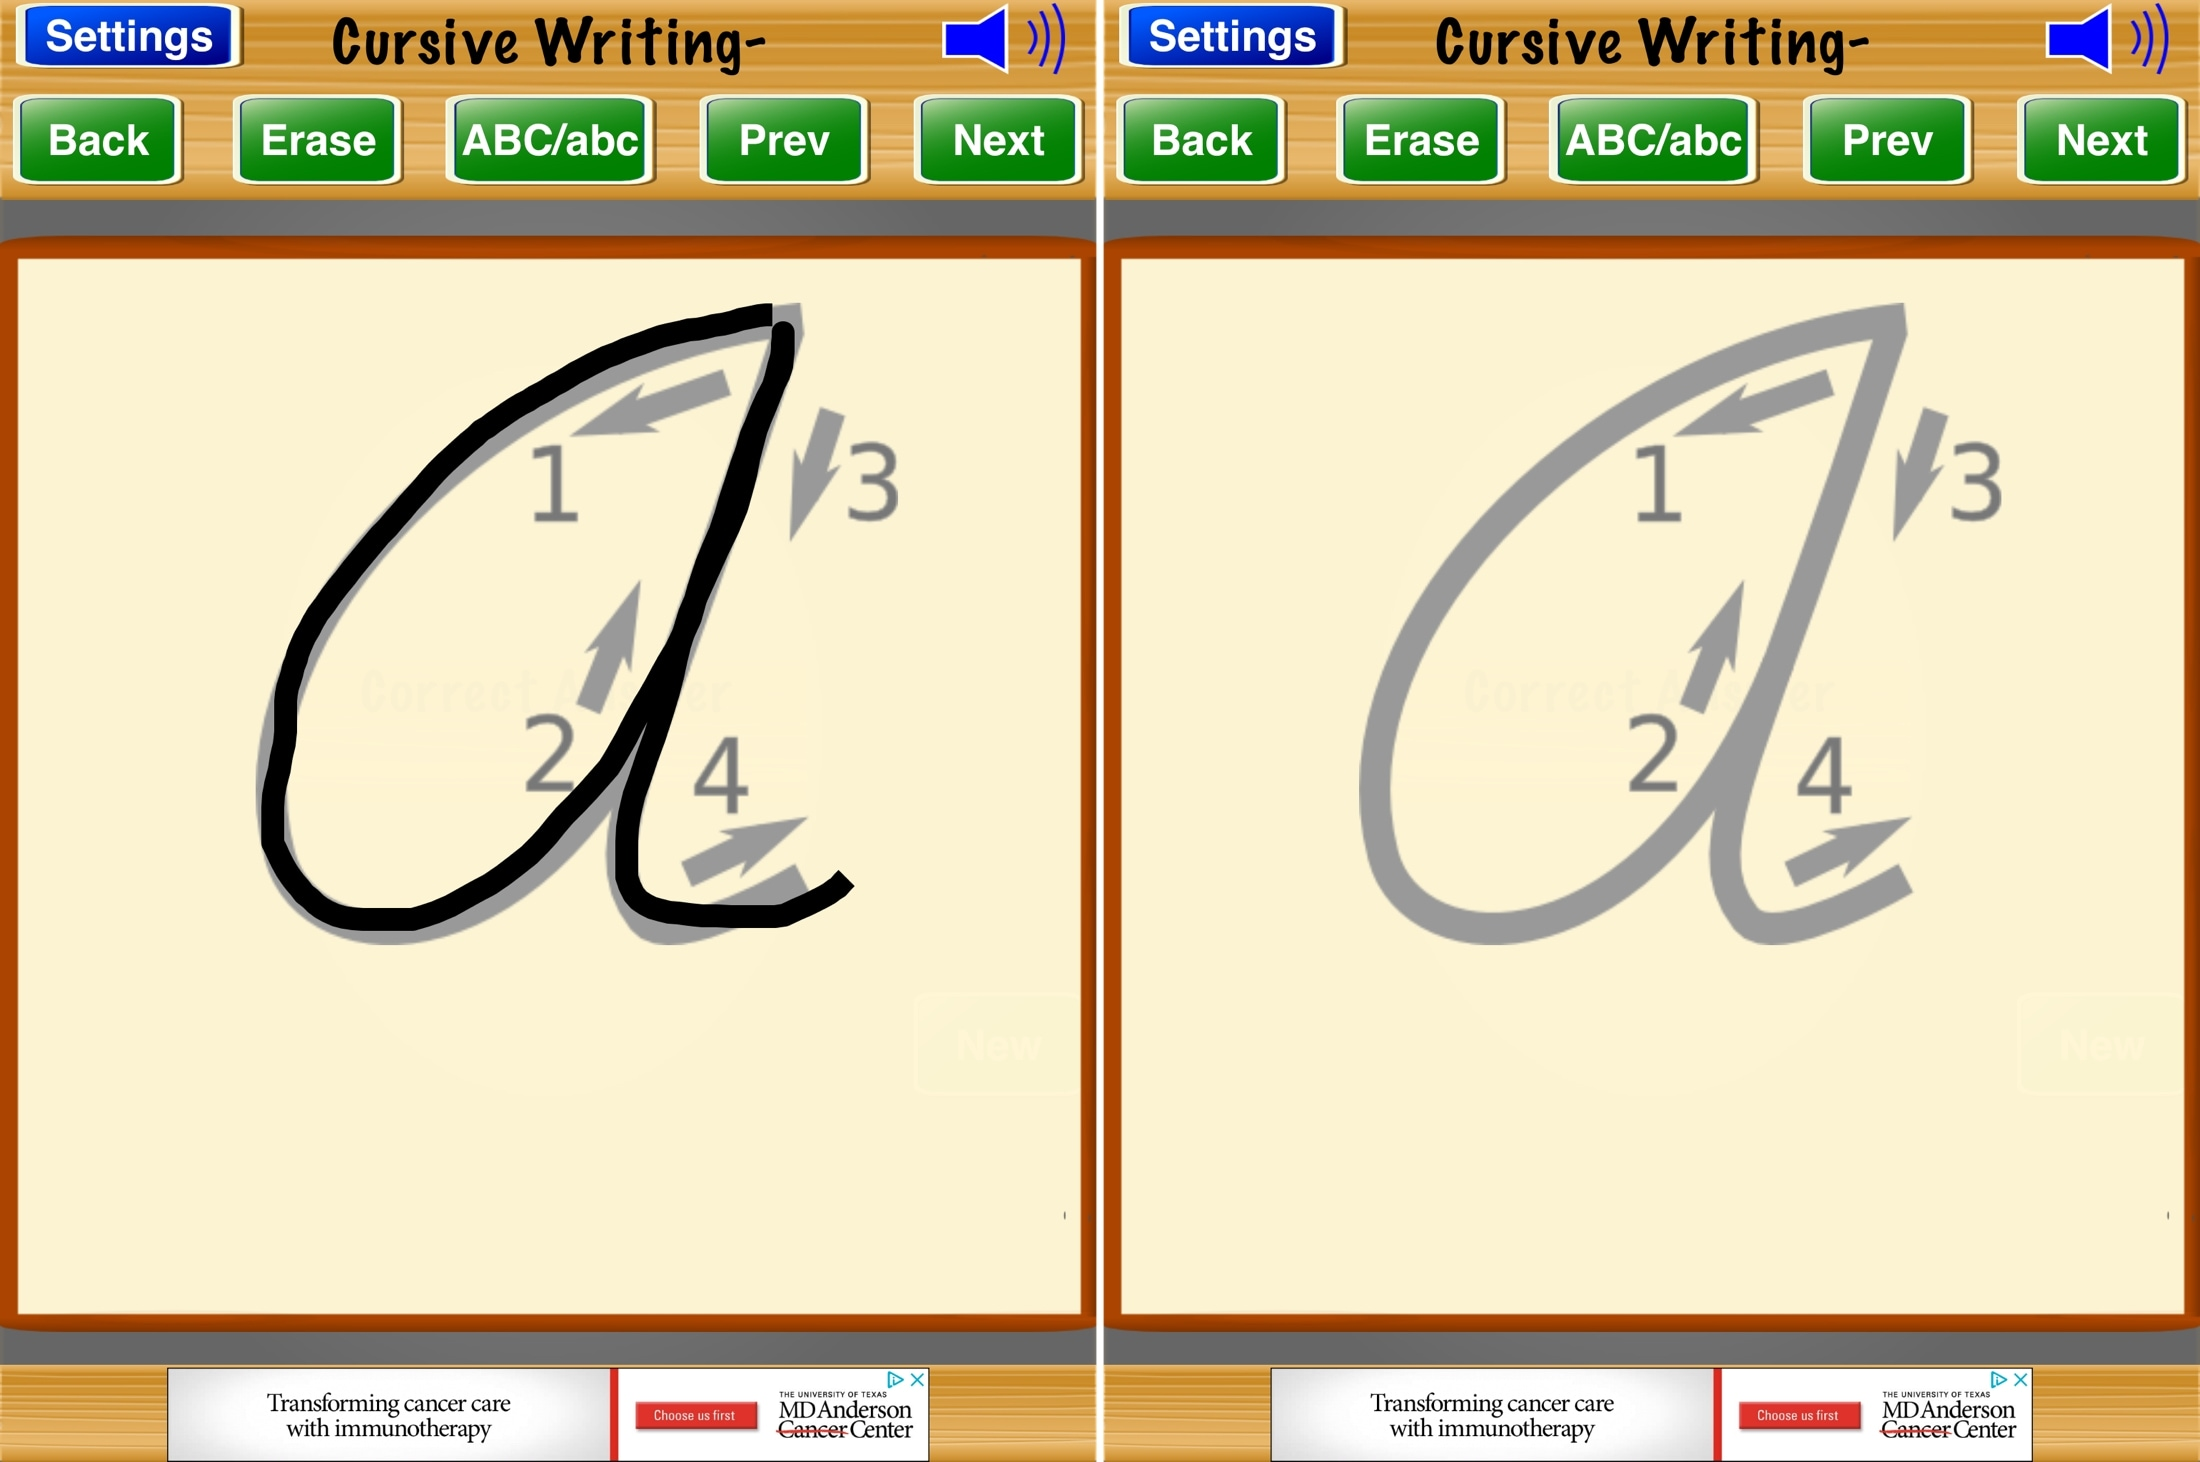 Cursive Writing- iPad